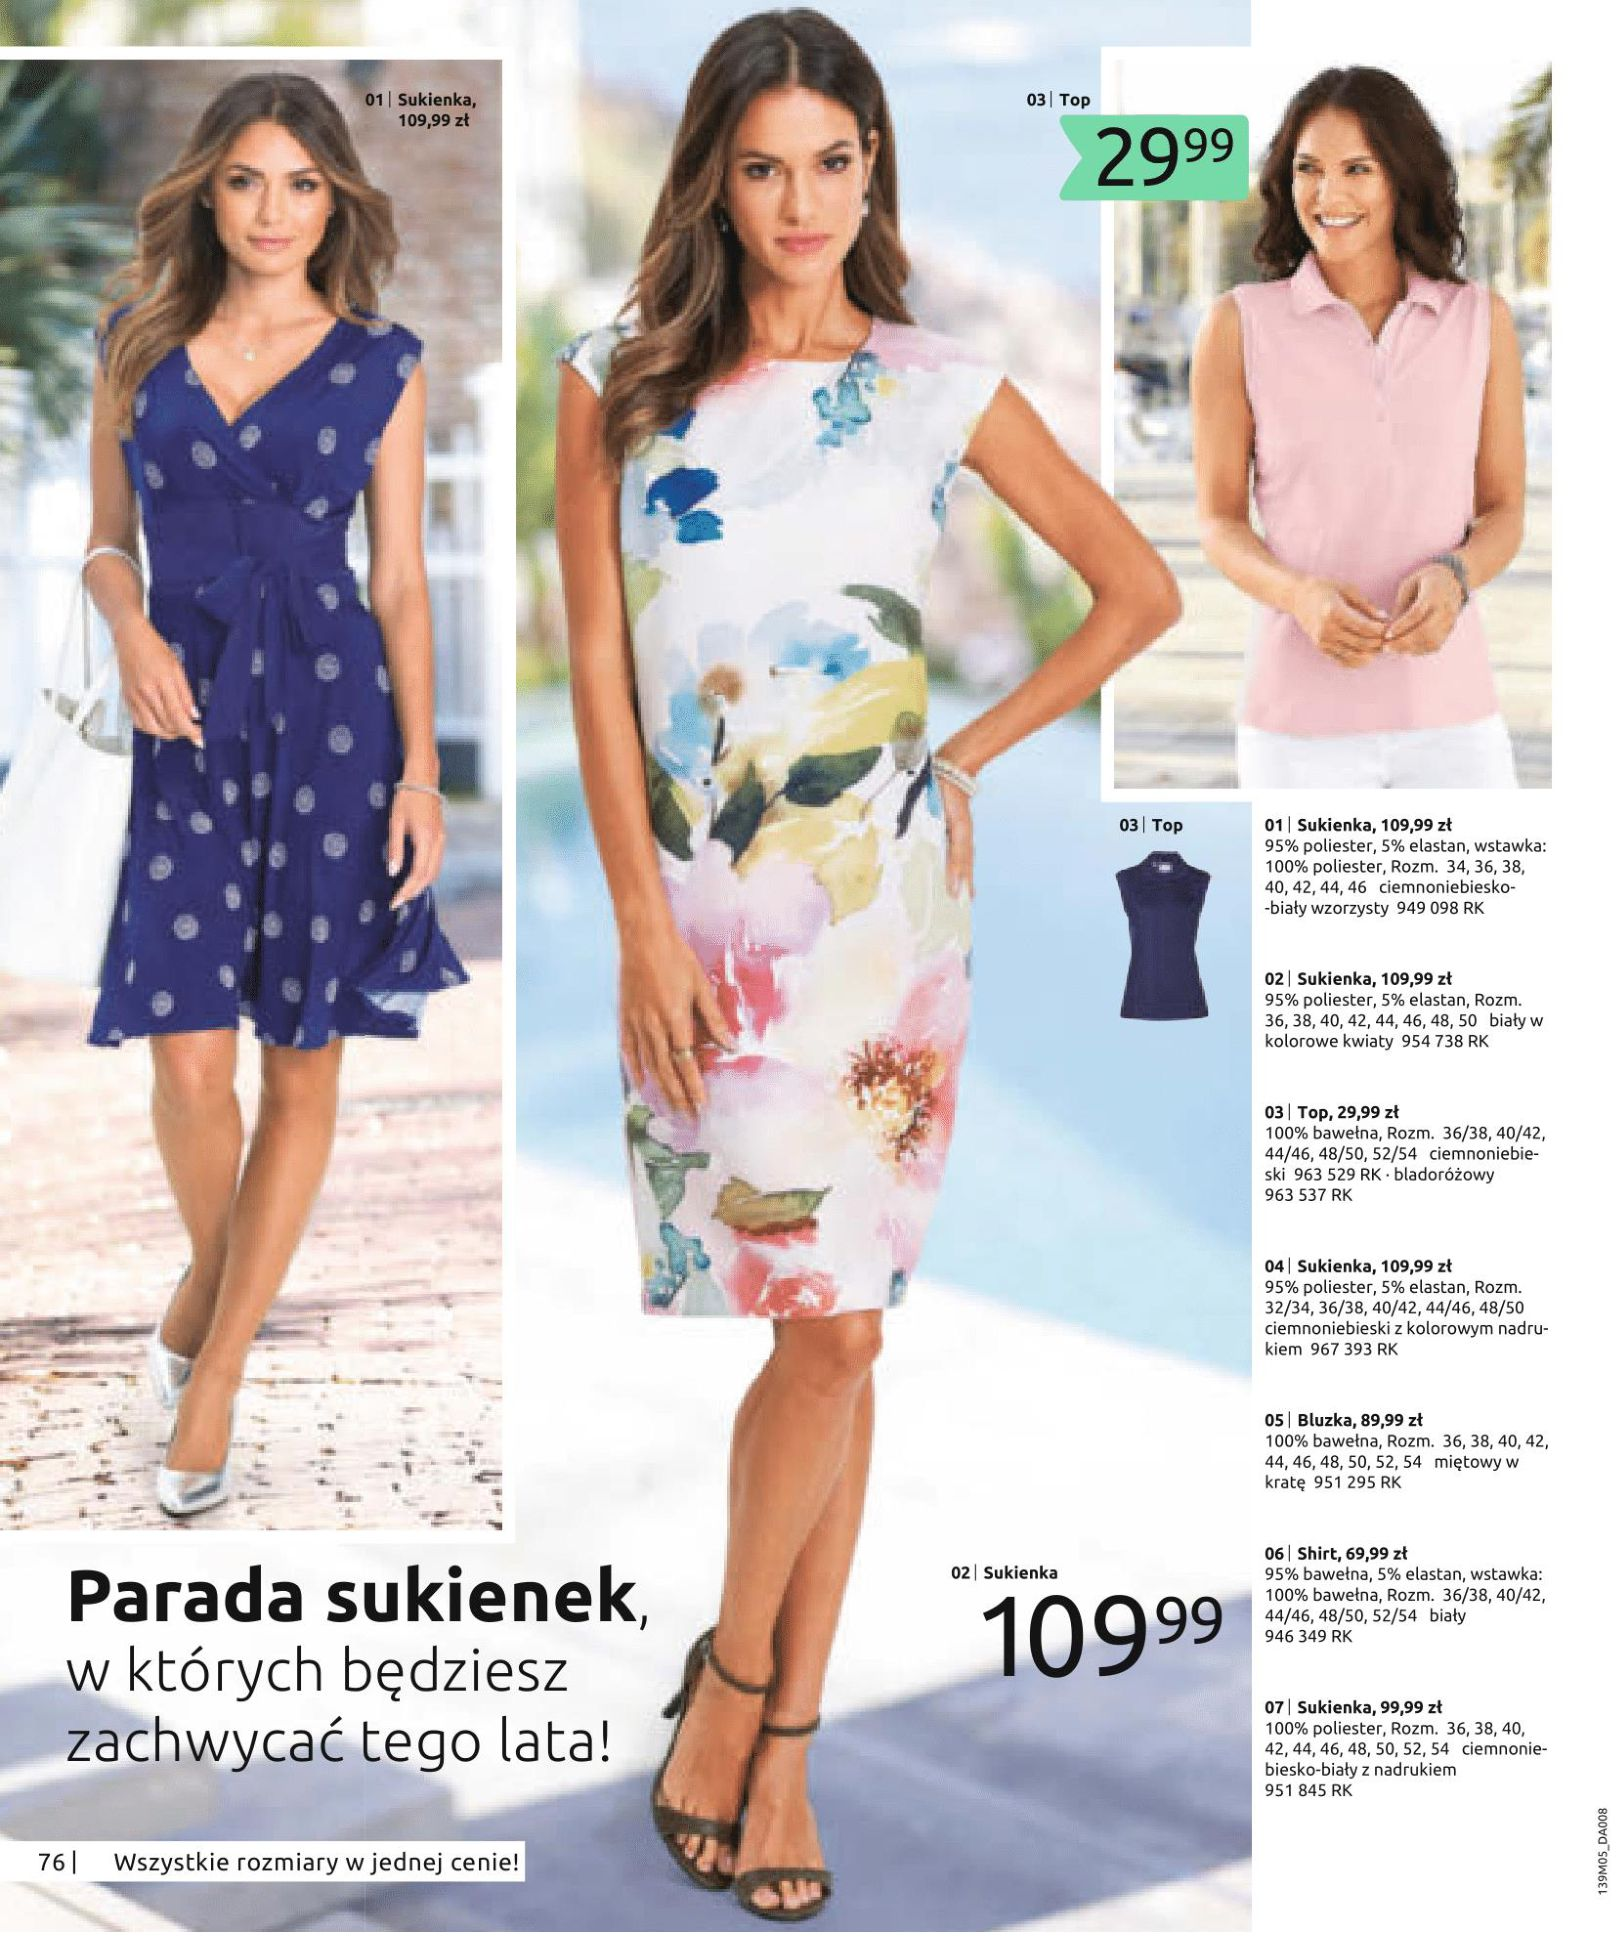 Gazetka Bonprix - Romantic Summer-02.07.2019-29.10.2019-page-